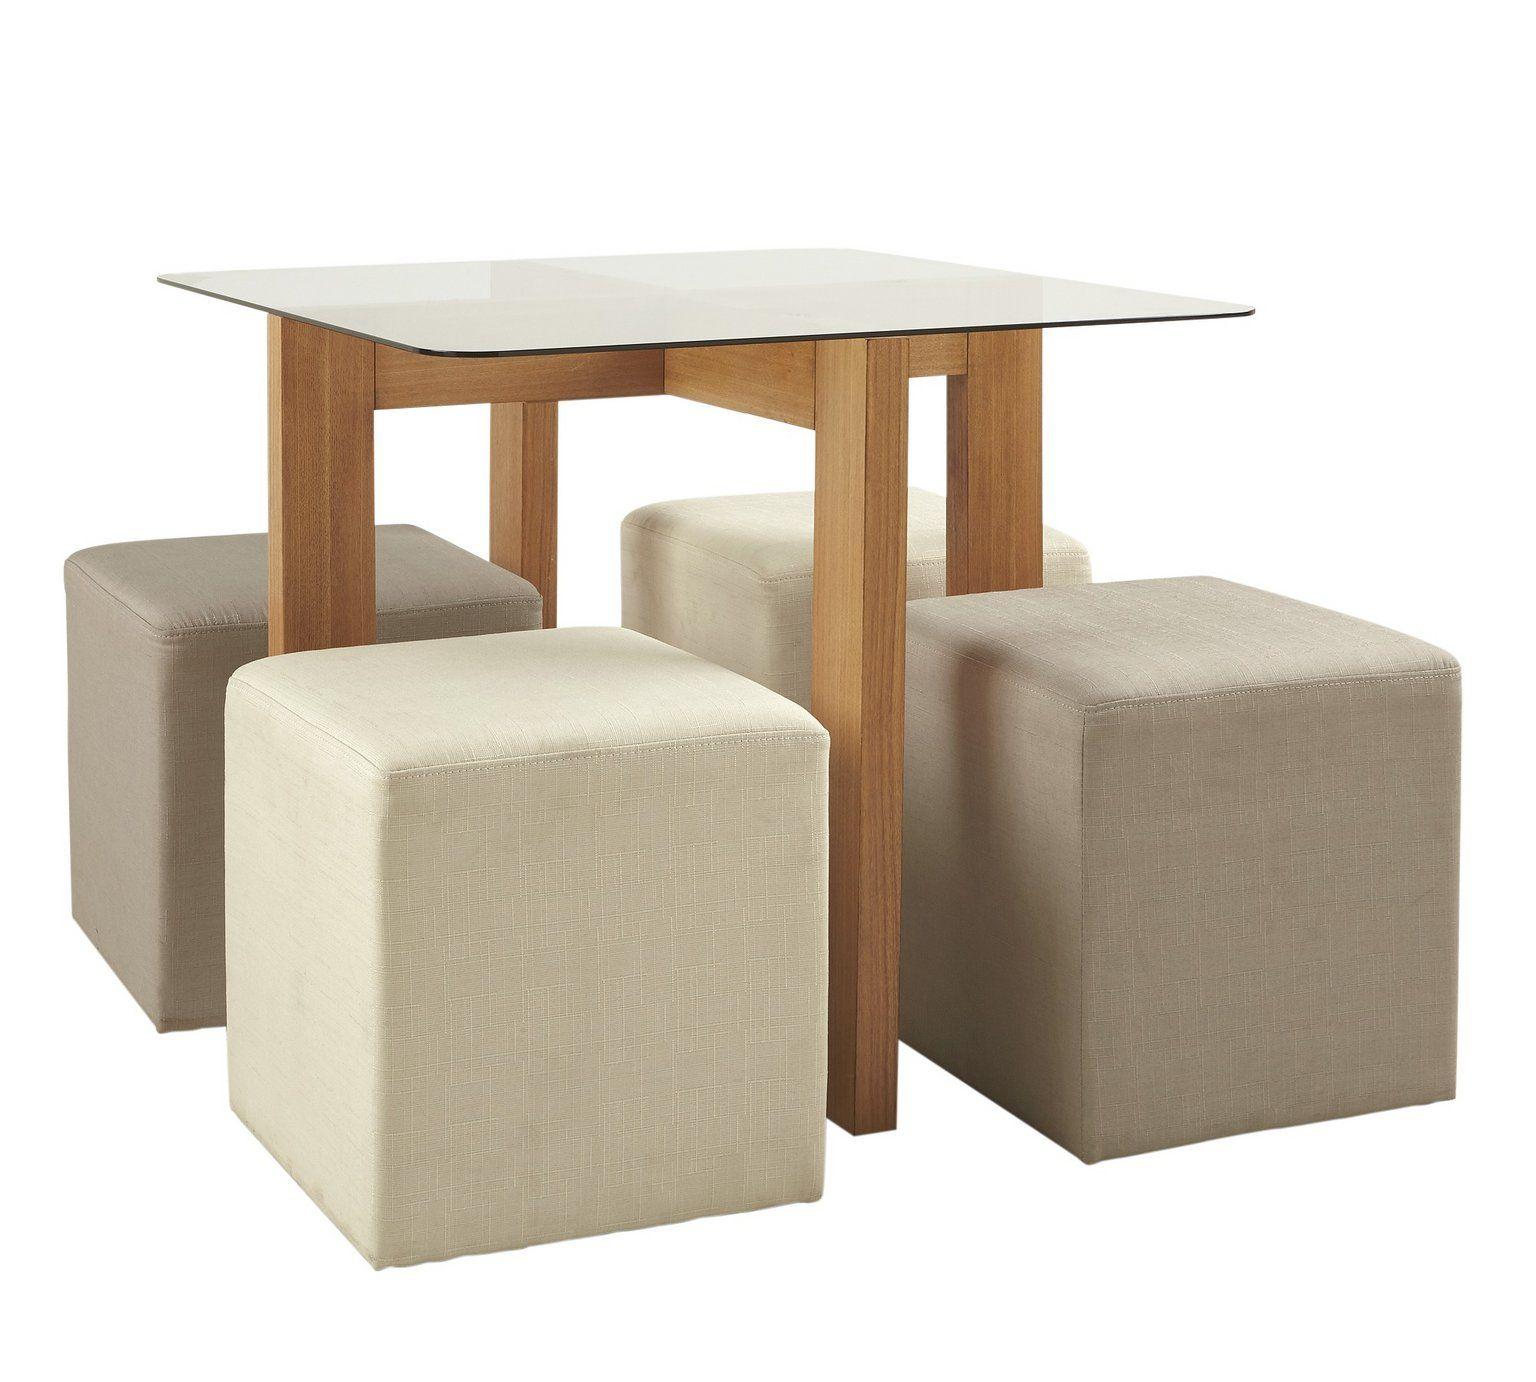 Buy Collection Vasso Glass & Ash Veneer Table & 4 Stools